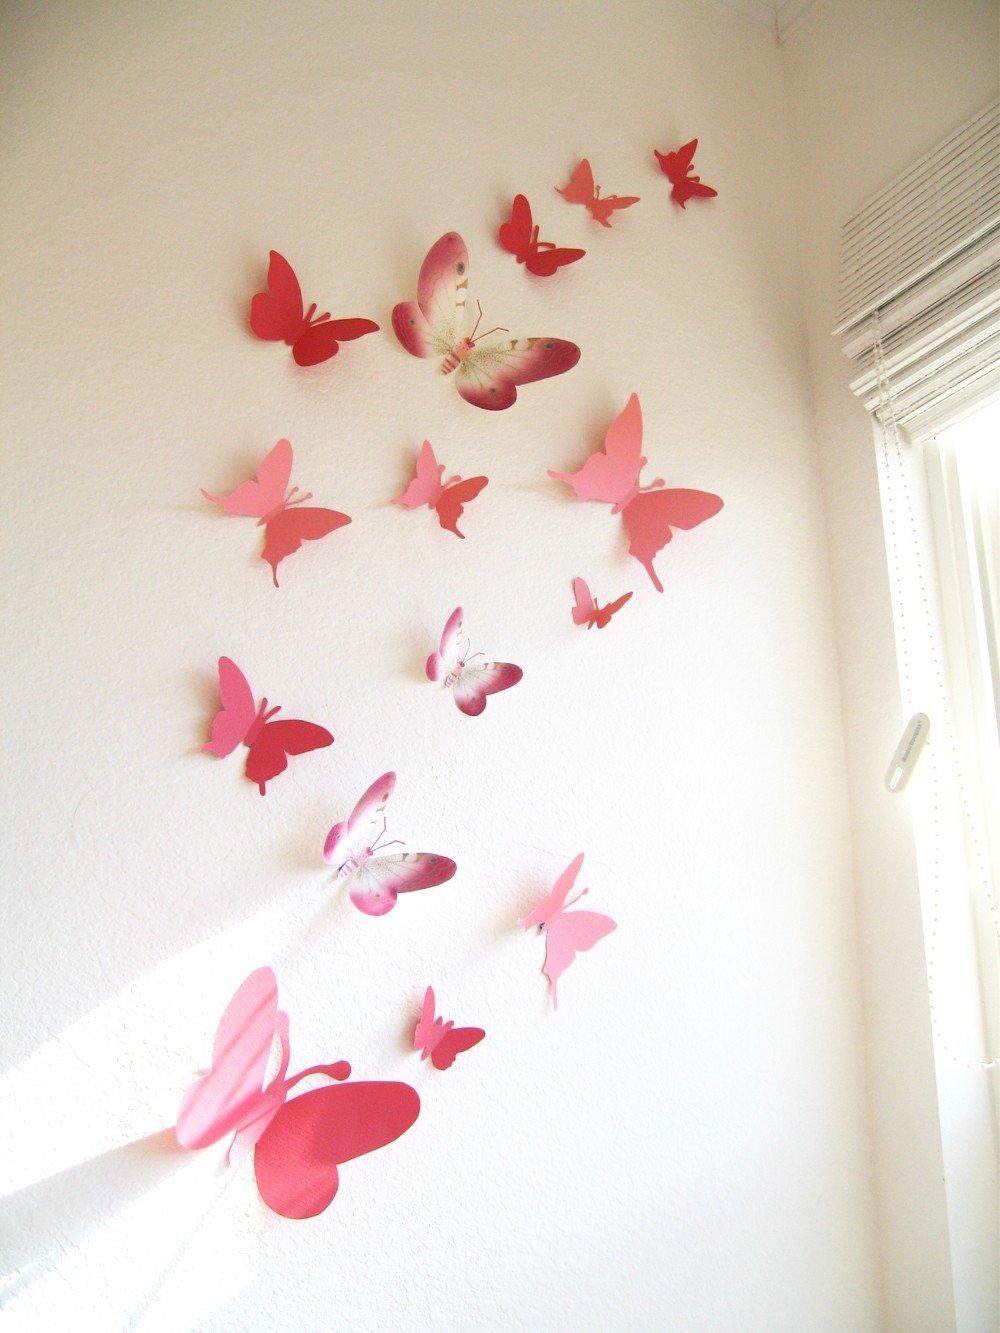 Декор стен бабочками своими руками: трафареты, материалы 37